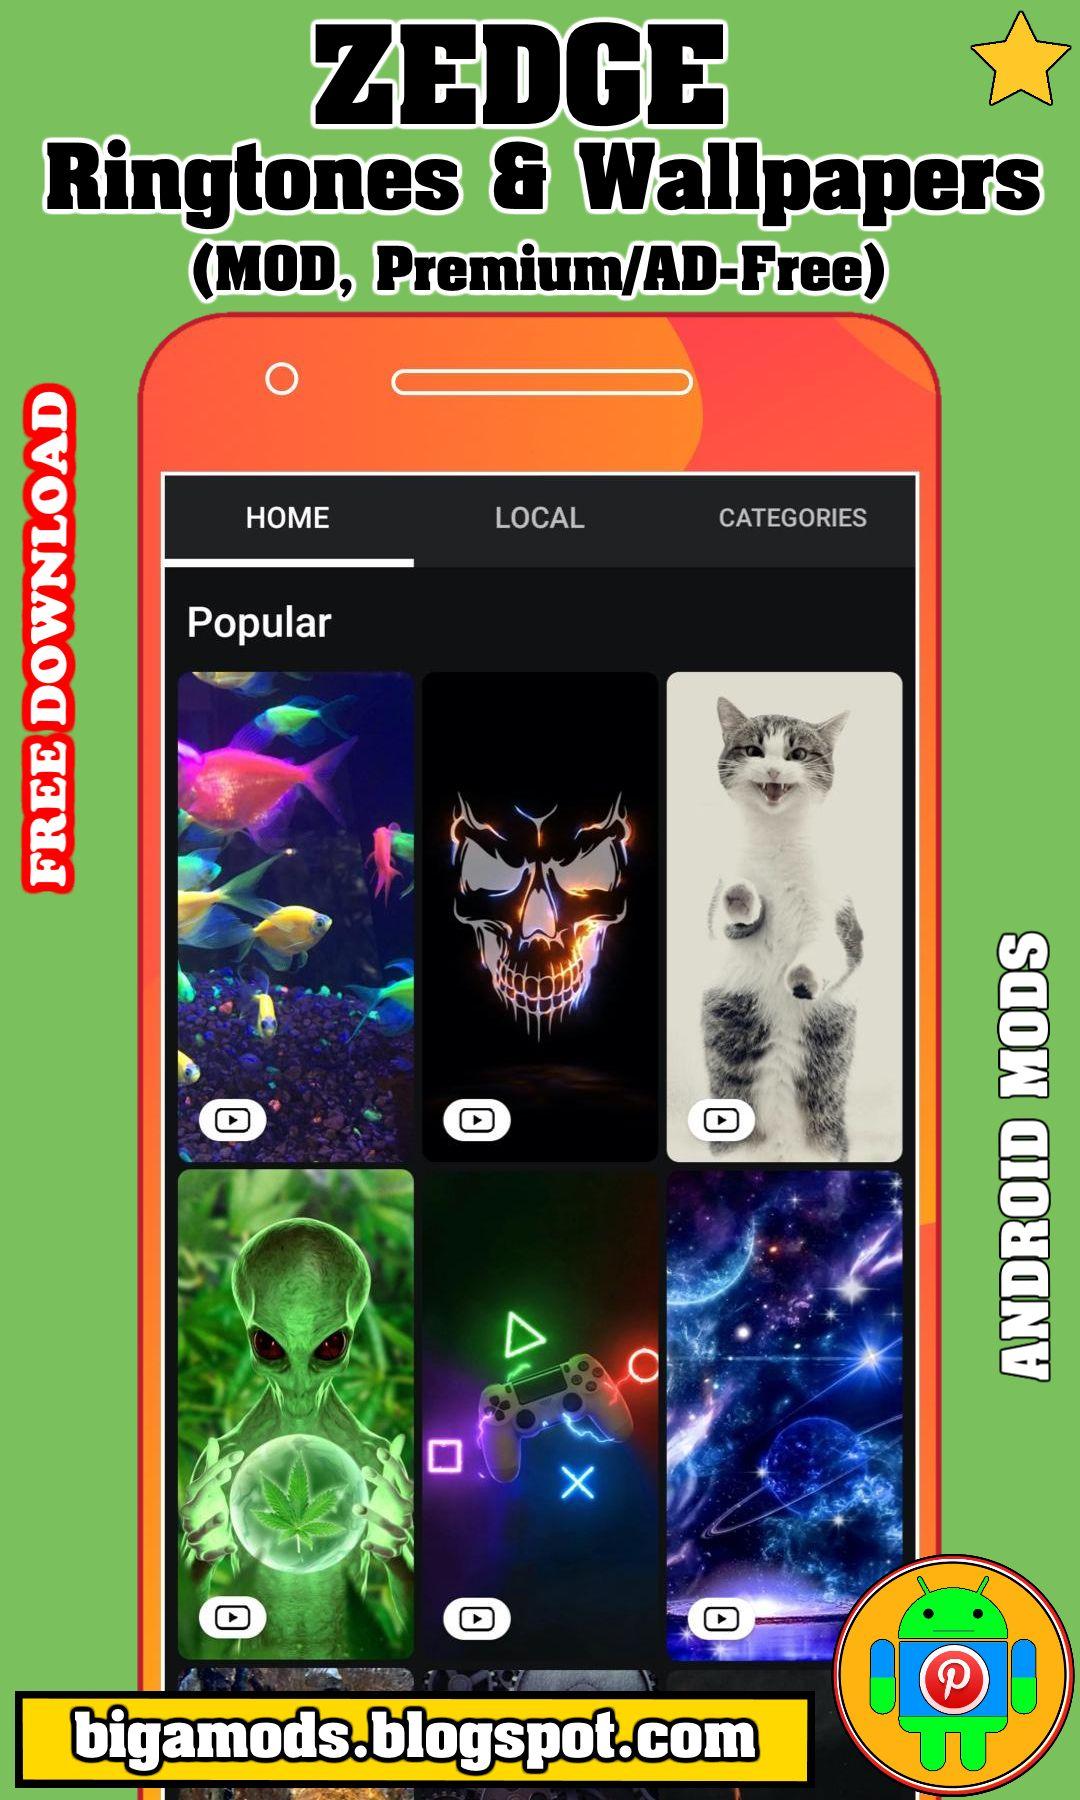 Zedge Ringtones Wallpapers Mod Premium Ad Free Download Zedge Ringtones Wallpapers Mod In 2021 Ringtones For Android Ringtones Android Apps